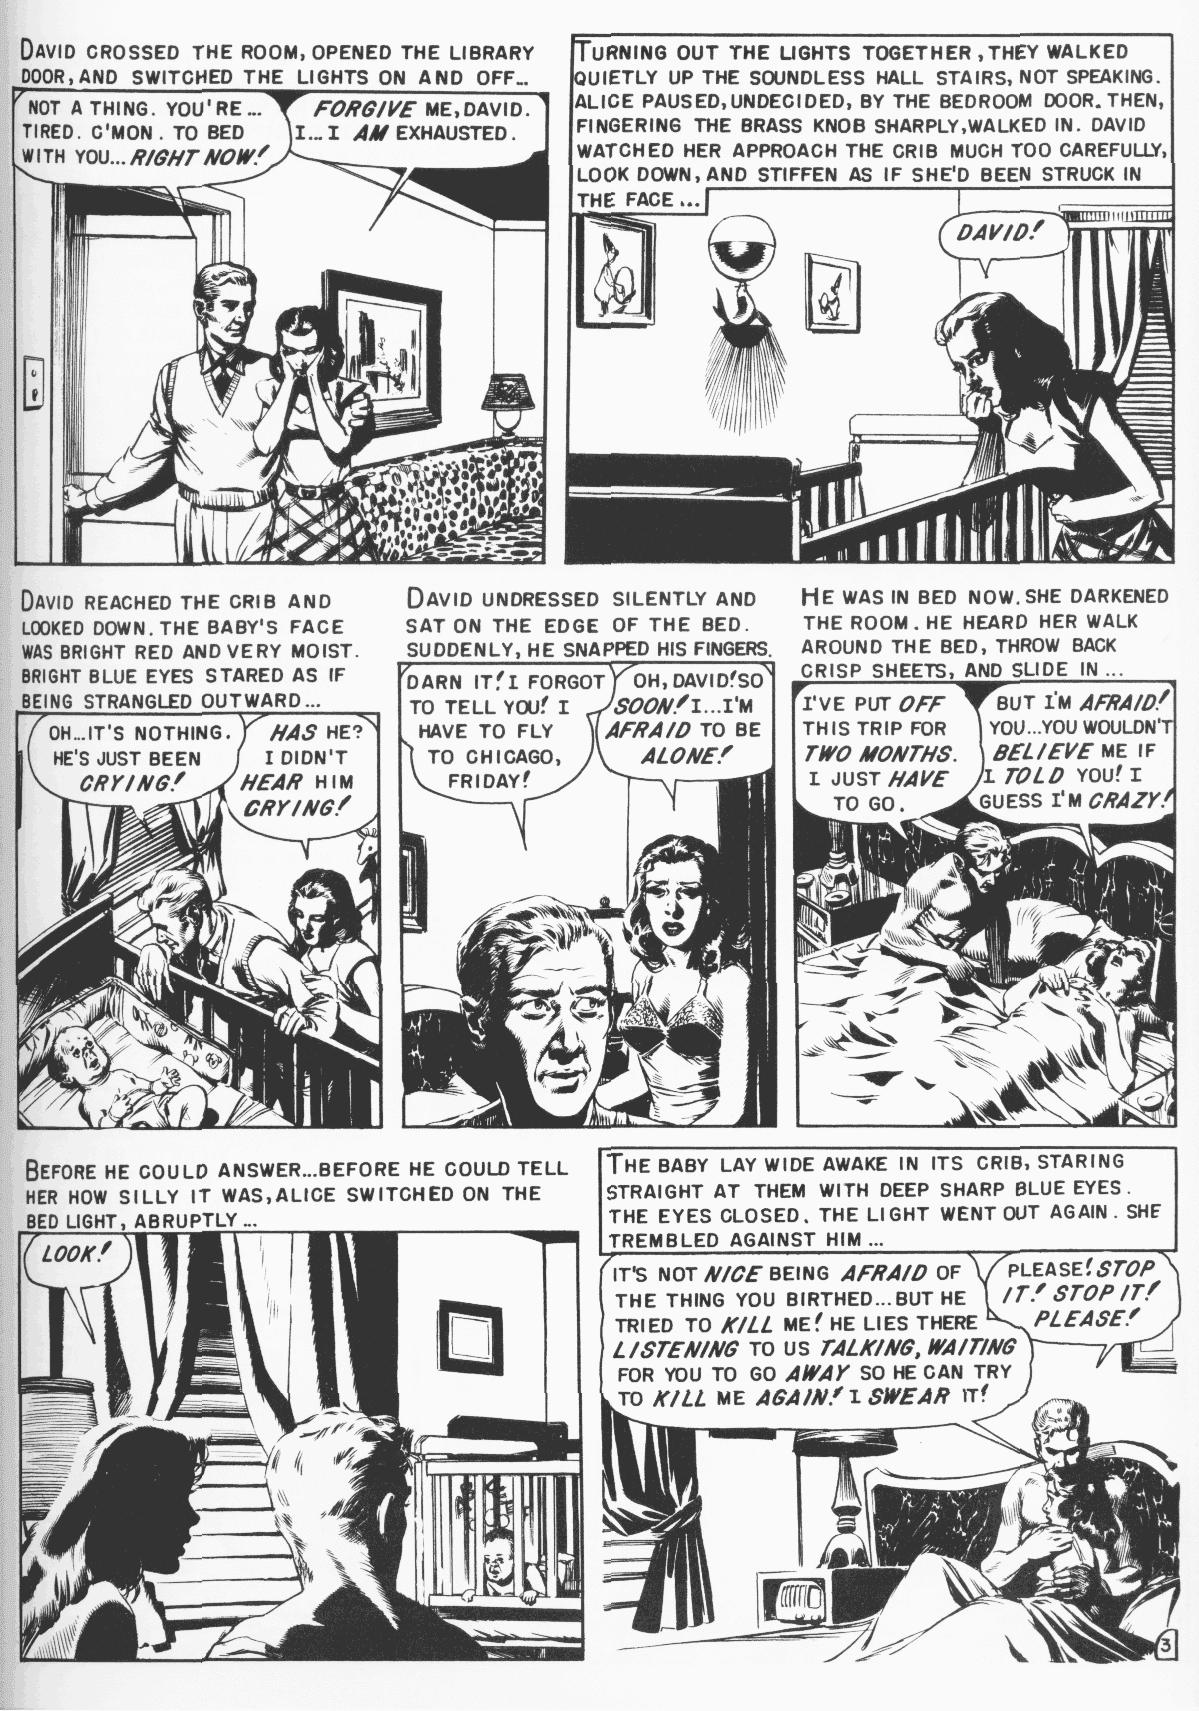 Read online Shock SuspenStories comic -  Issue #7 - 29